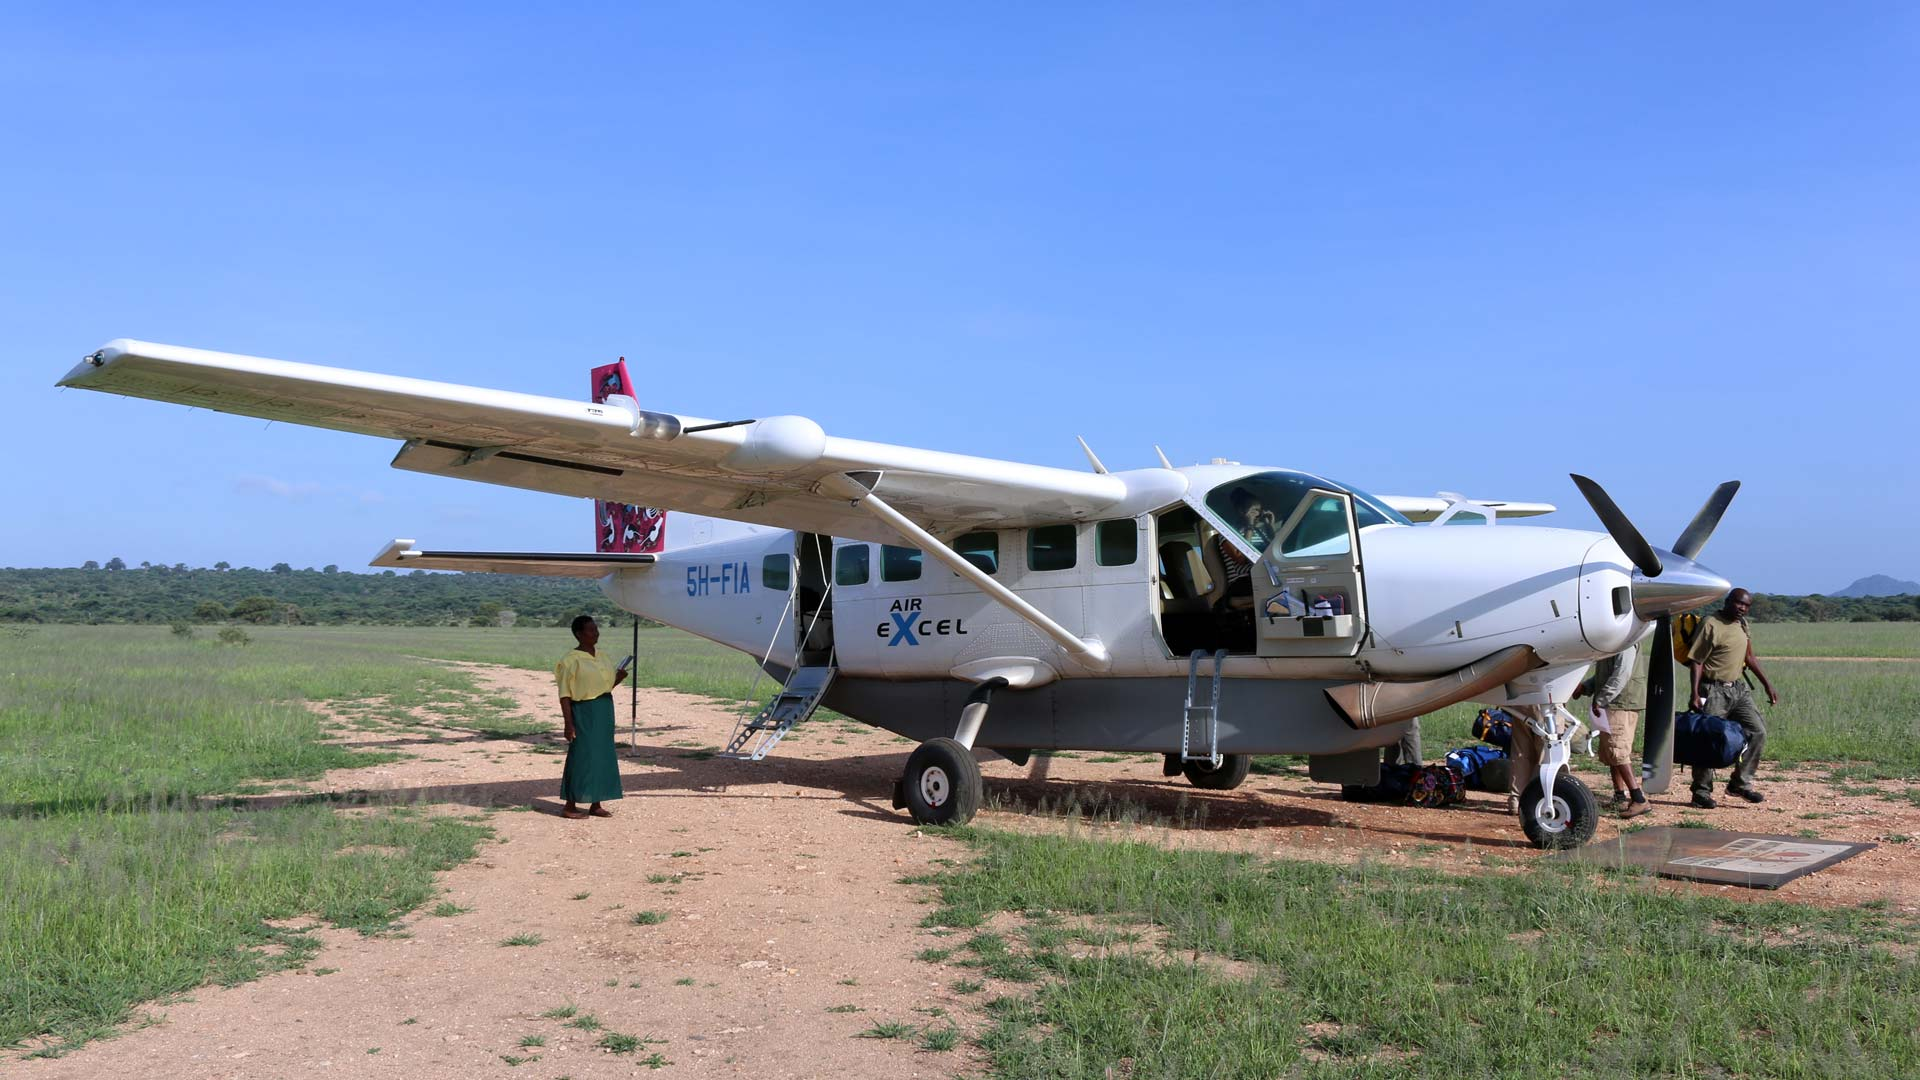 Cessna Caravan C208 aircraft